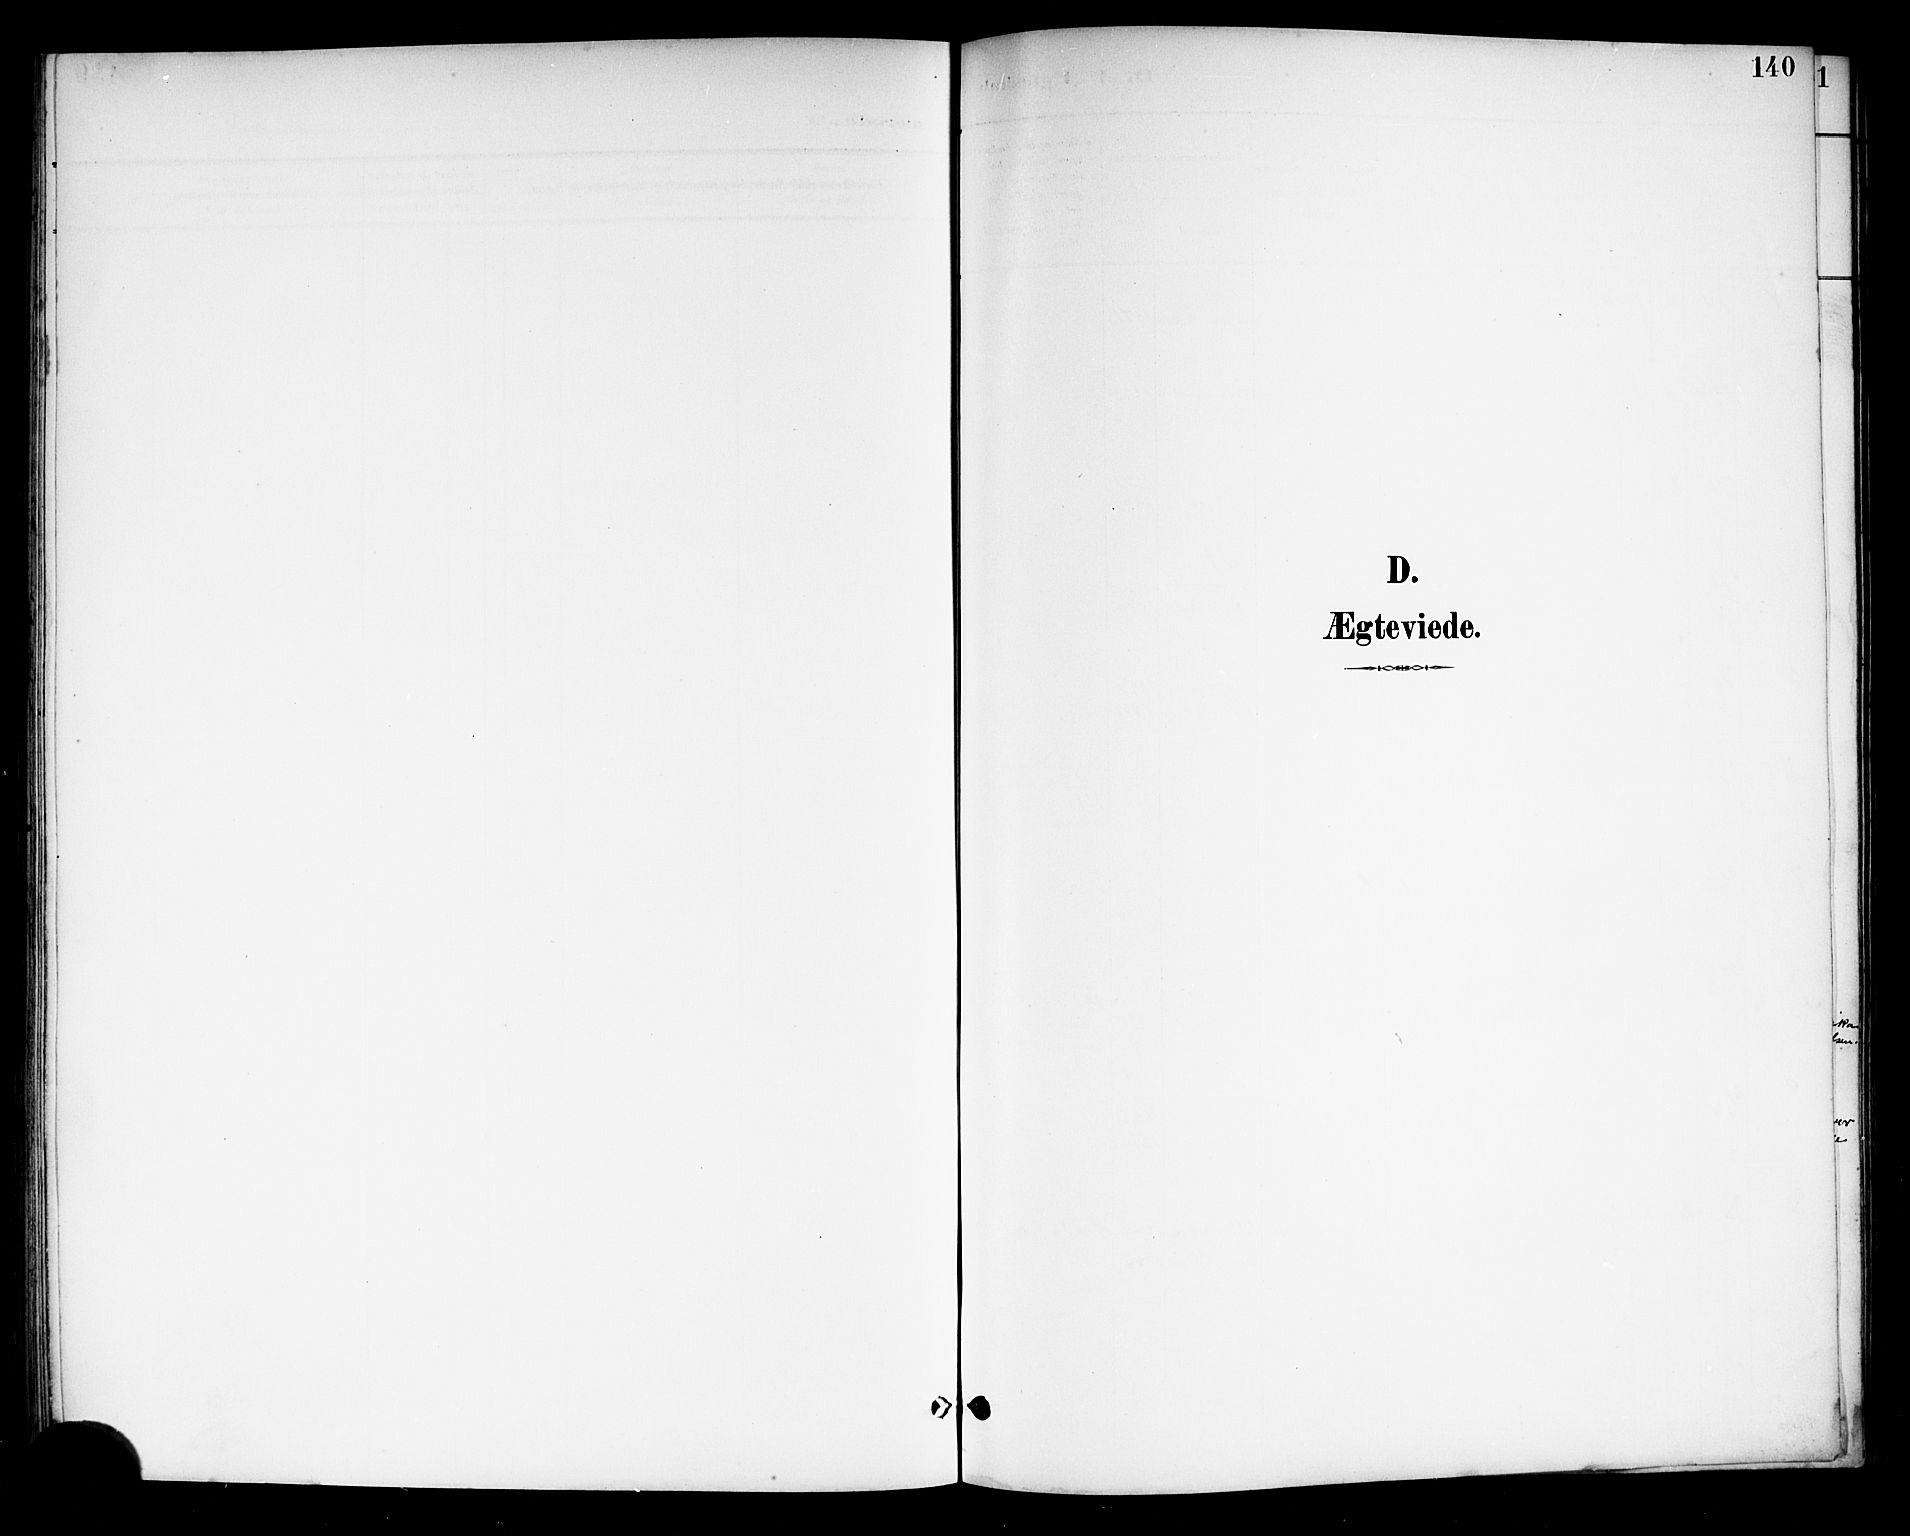 SAKO, Drangedal kirkebøker, G/Gb/L0002: Klokkerbok nr. II 2, 1895-1918, s. 140